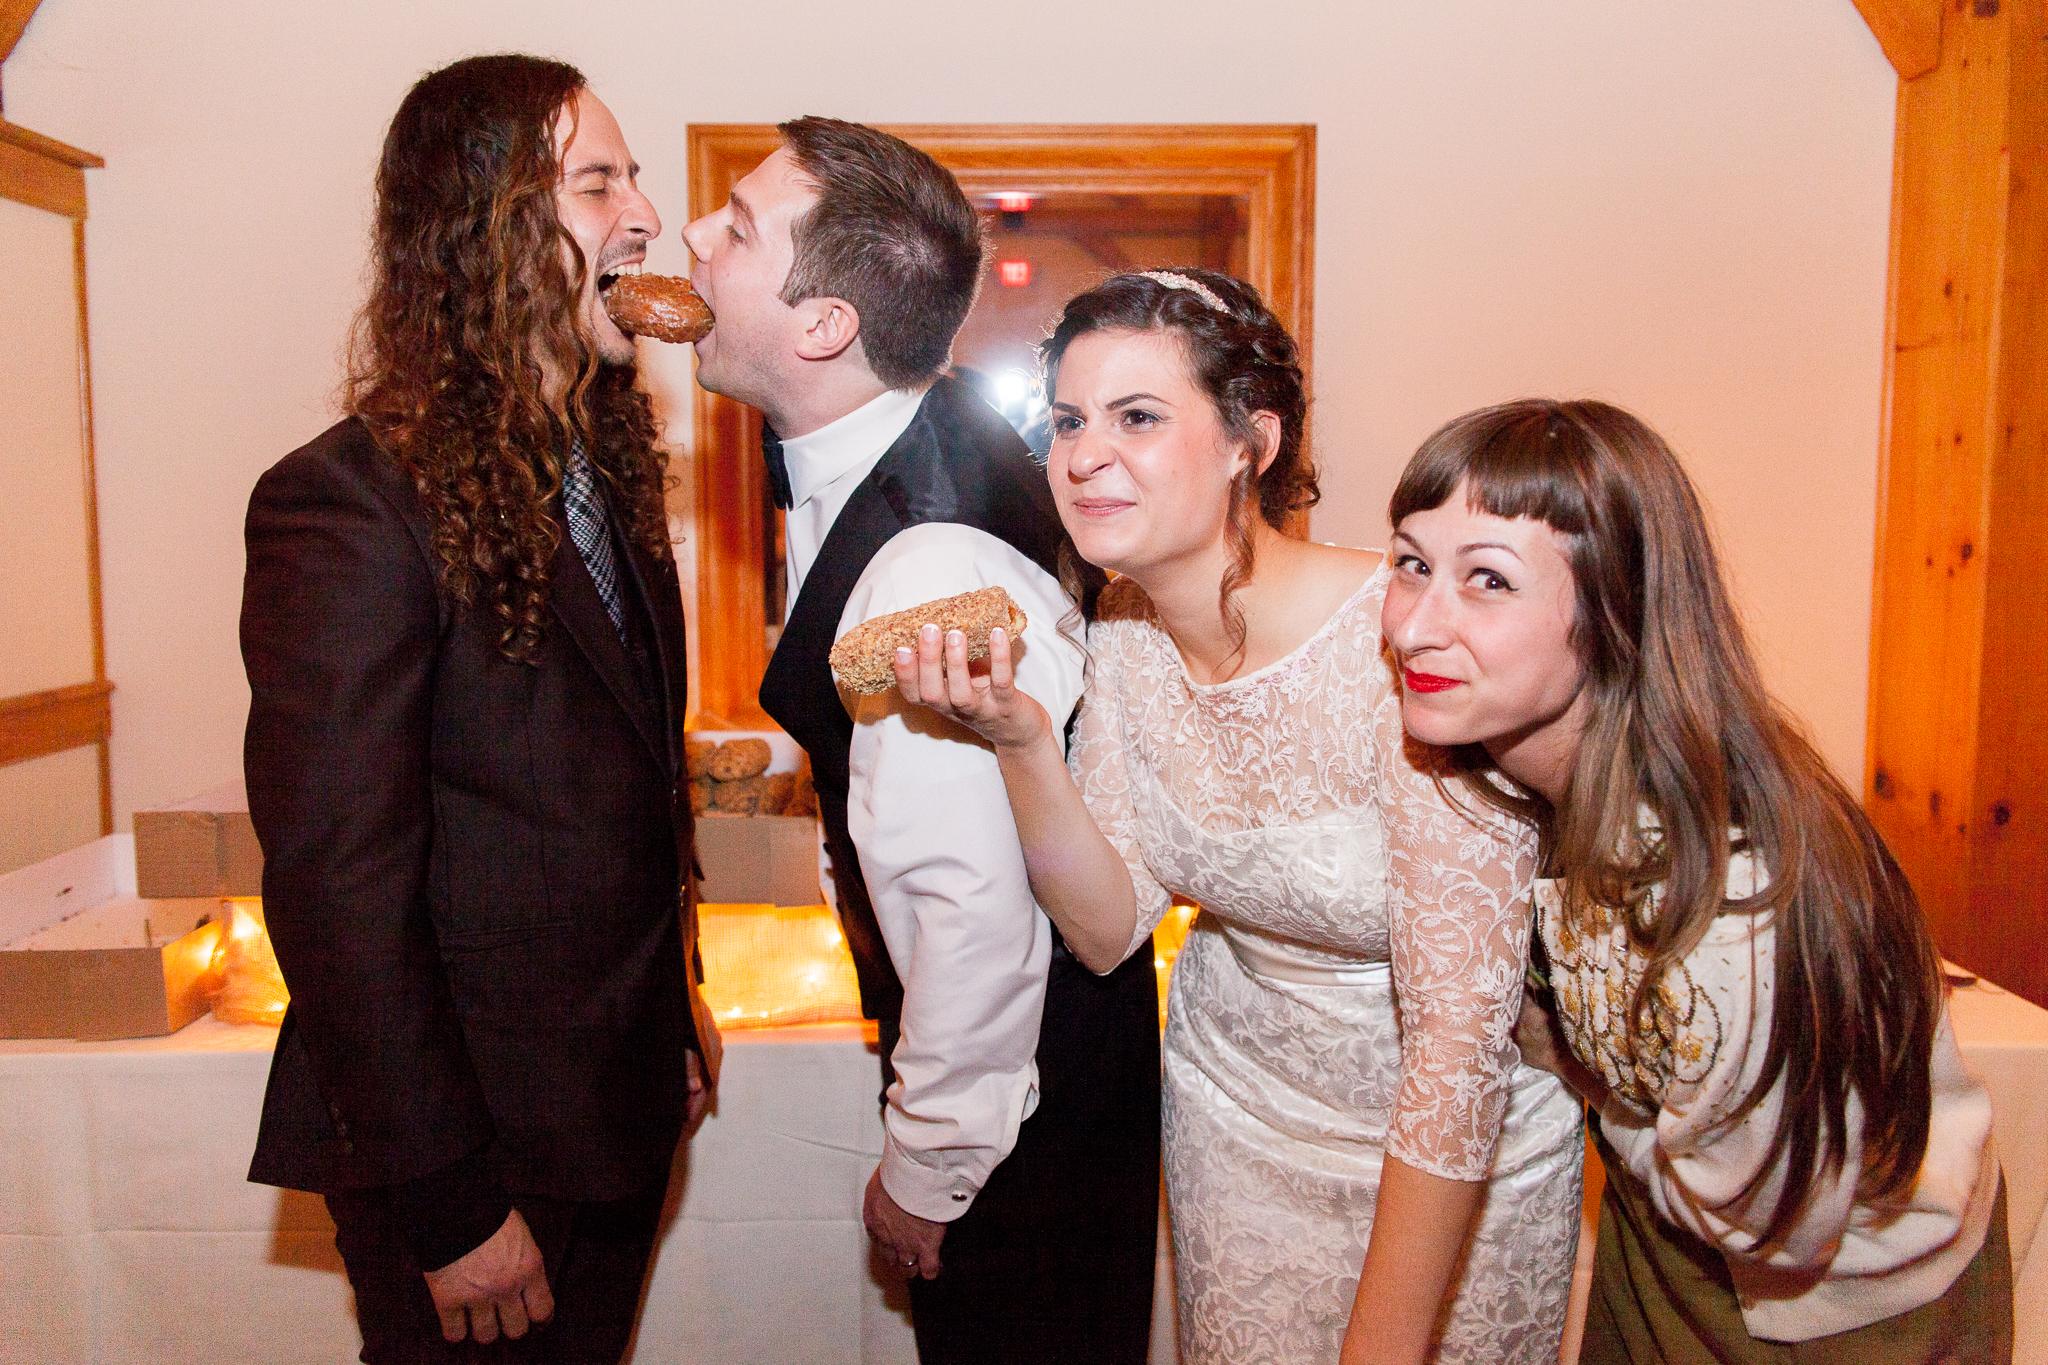 camuglia-whomstudio-chelsea_and_andy-nycphotographer-wedding-brooklyn-buffalo-timberlodge-170-1104.jpg